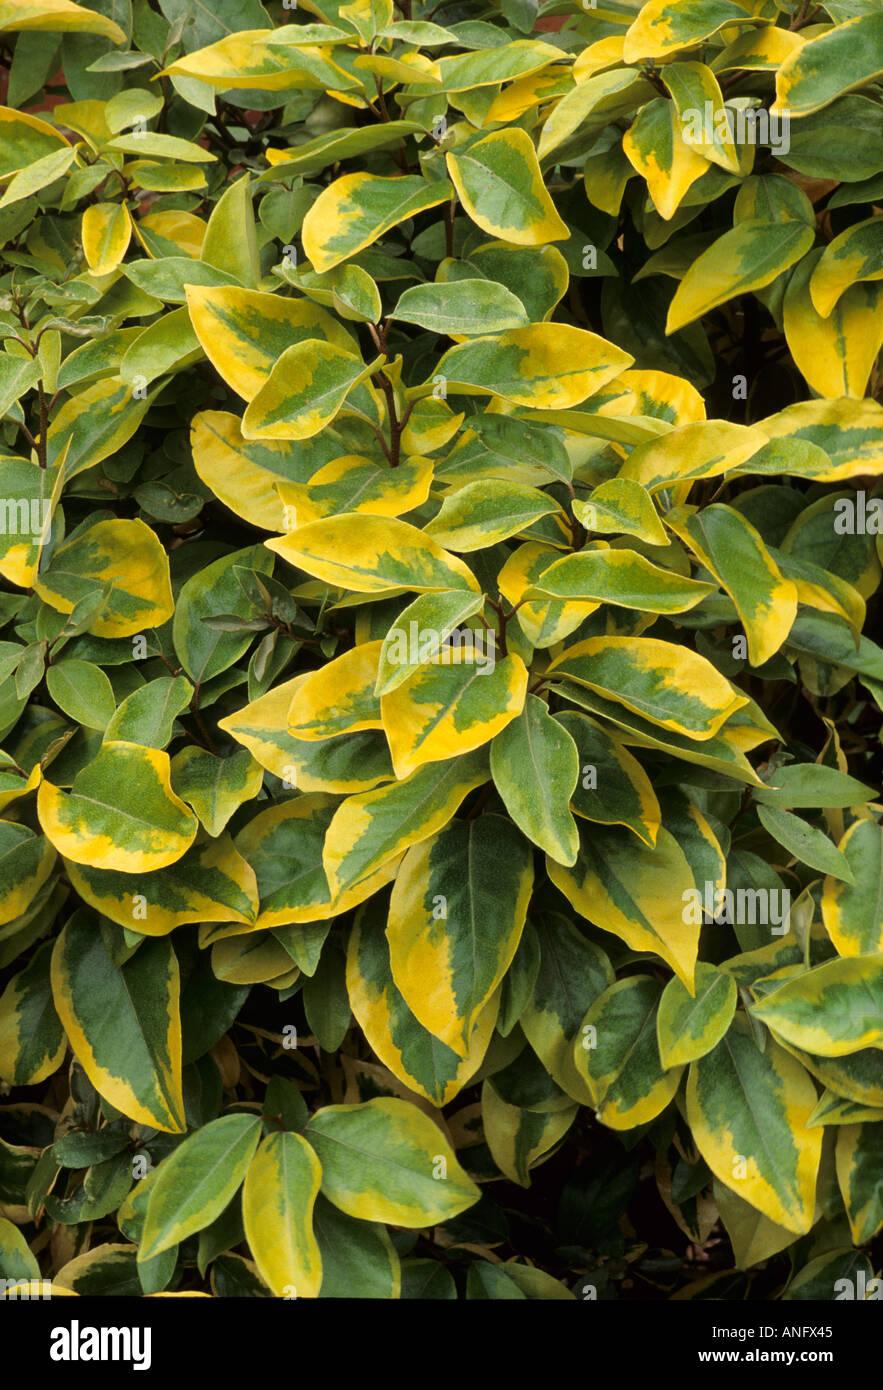 Eleagnus x ebbingei 'Gilt Edge', green leaves, yellow edges, variegated plant garden - Stock Image